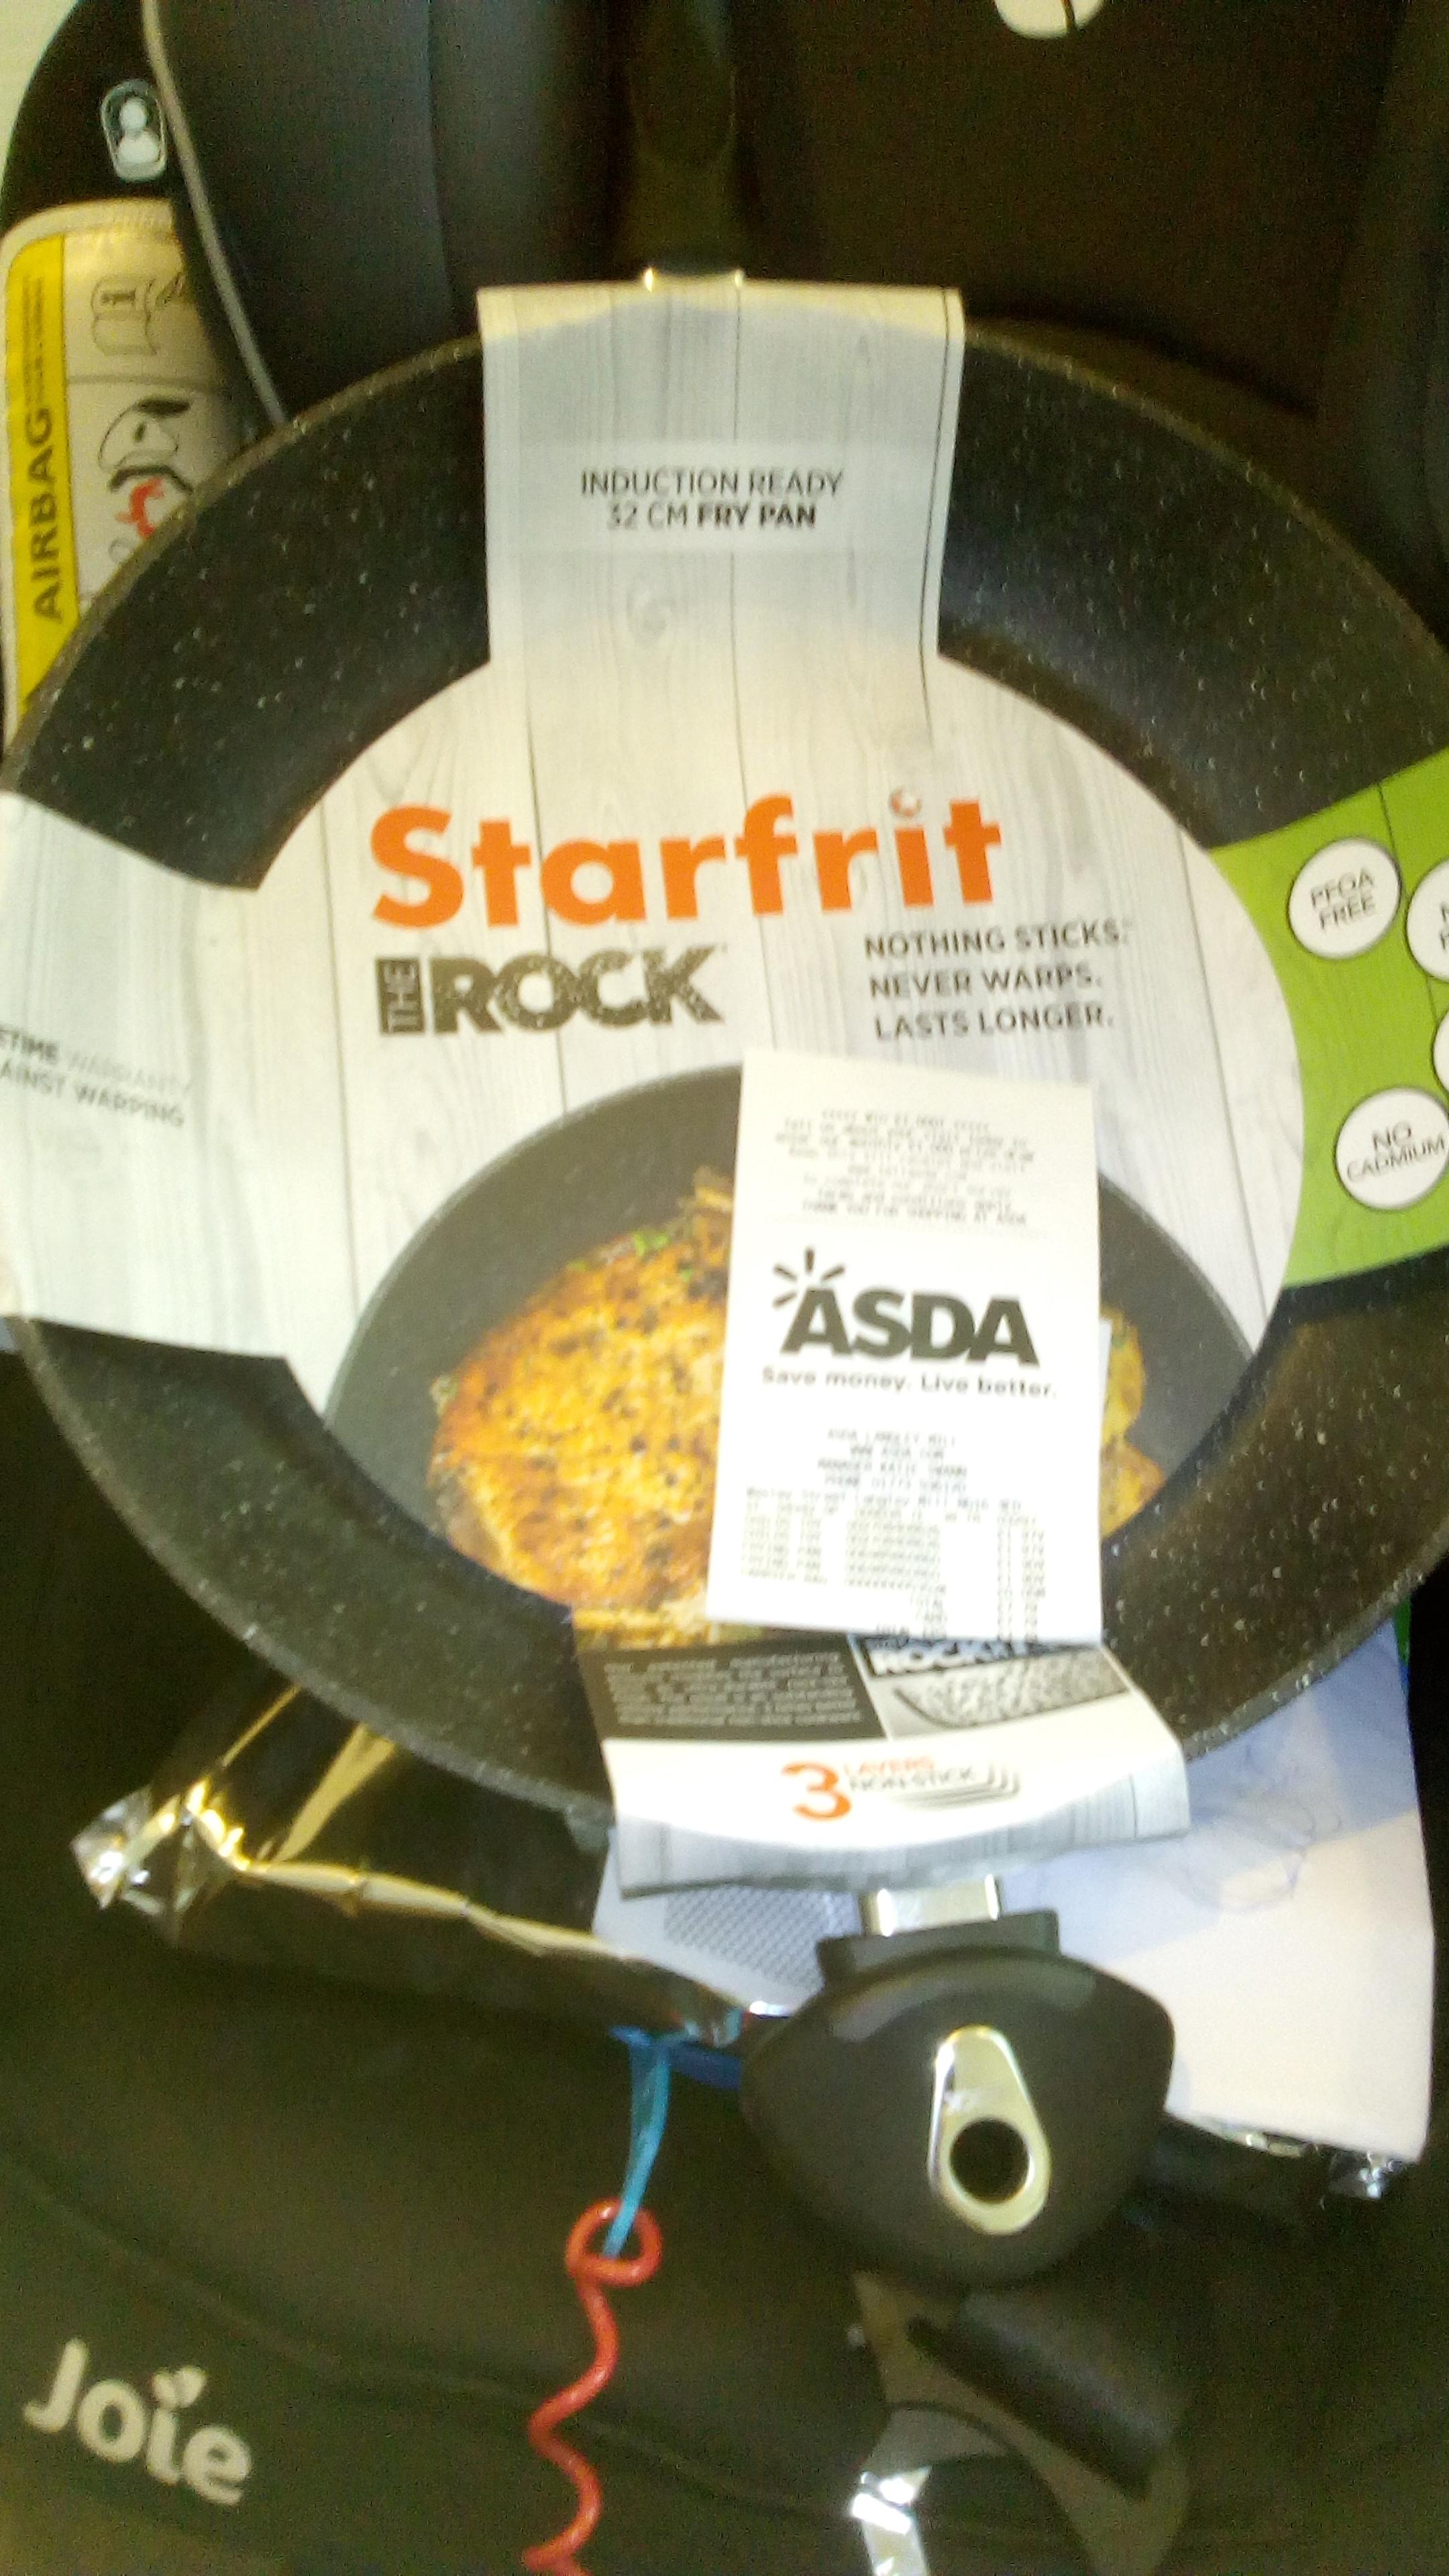 Starfrit - The Rock 32cm Frying Pan - £1.90 Instore at Asda